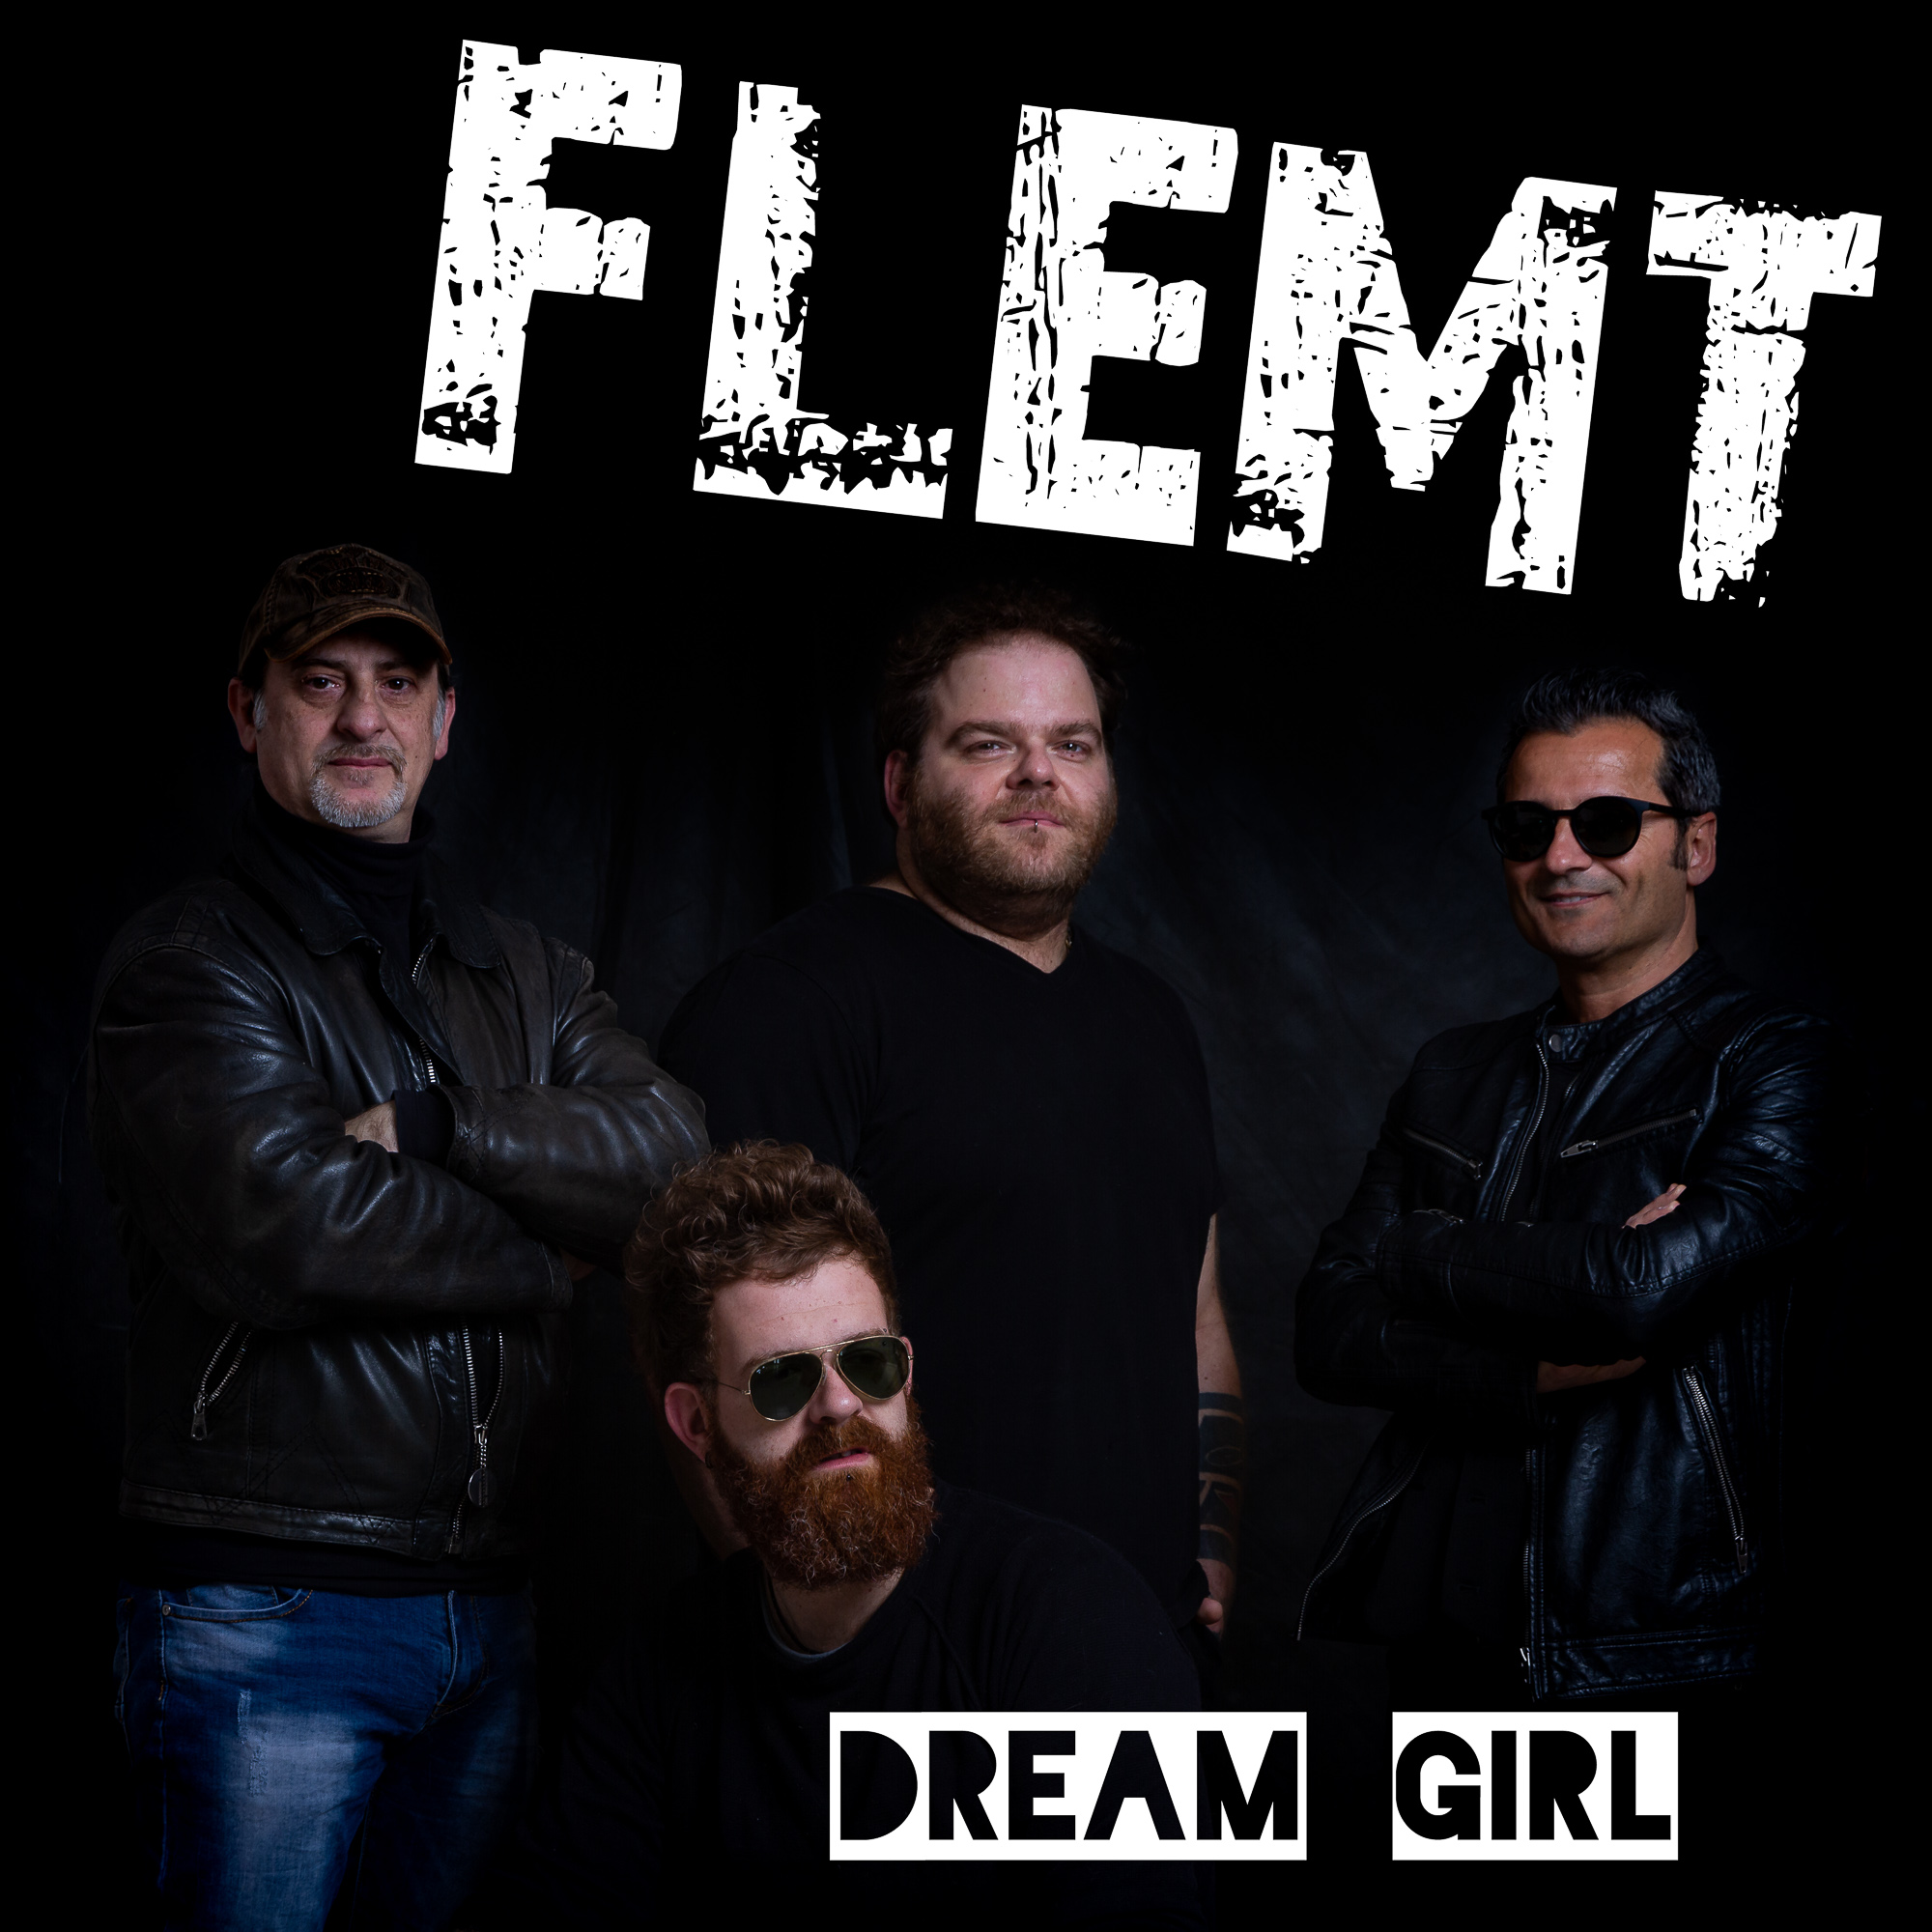 Dream-Girl-copertina-0001